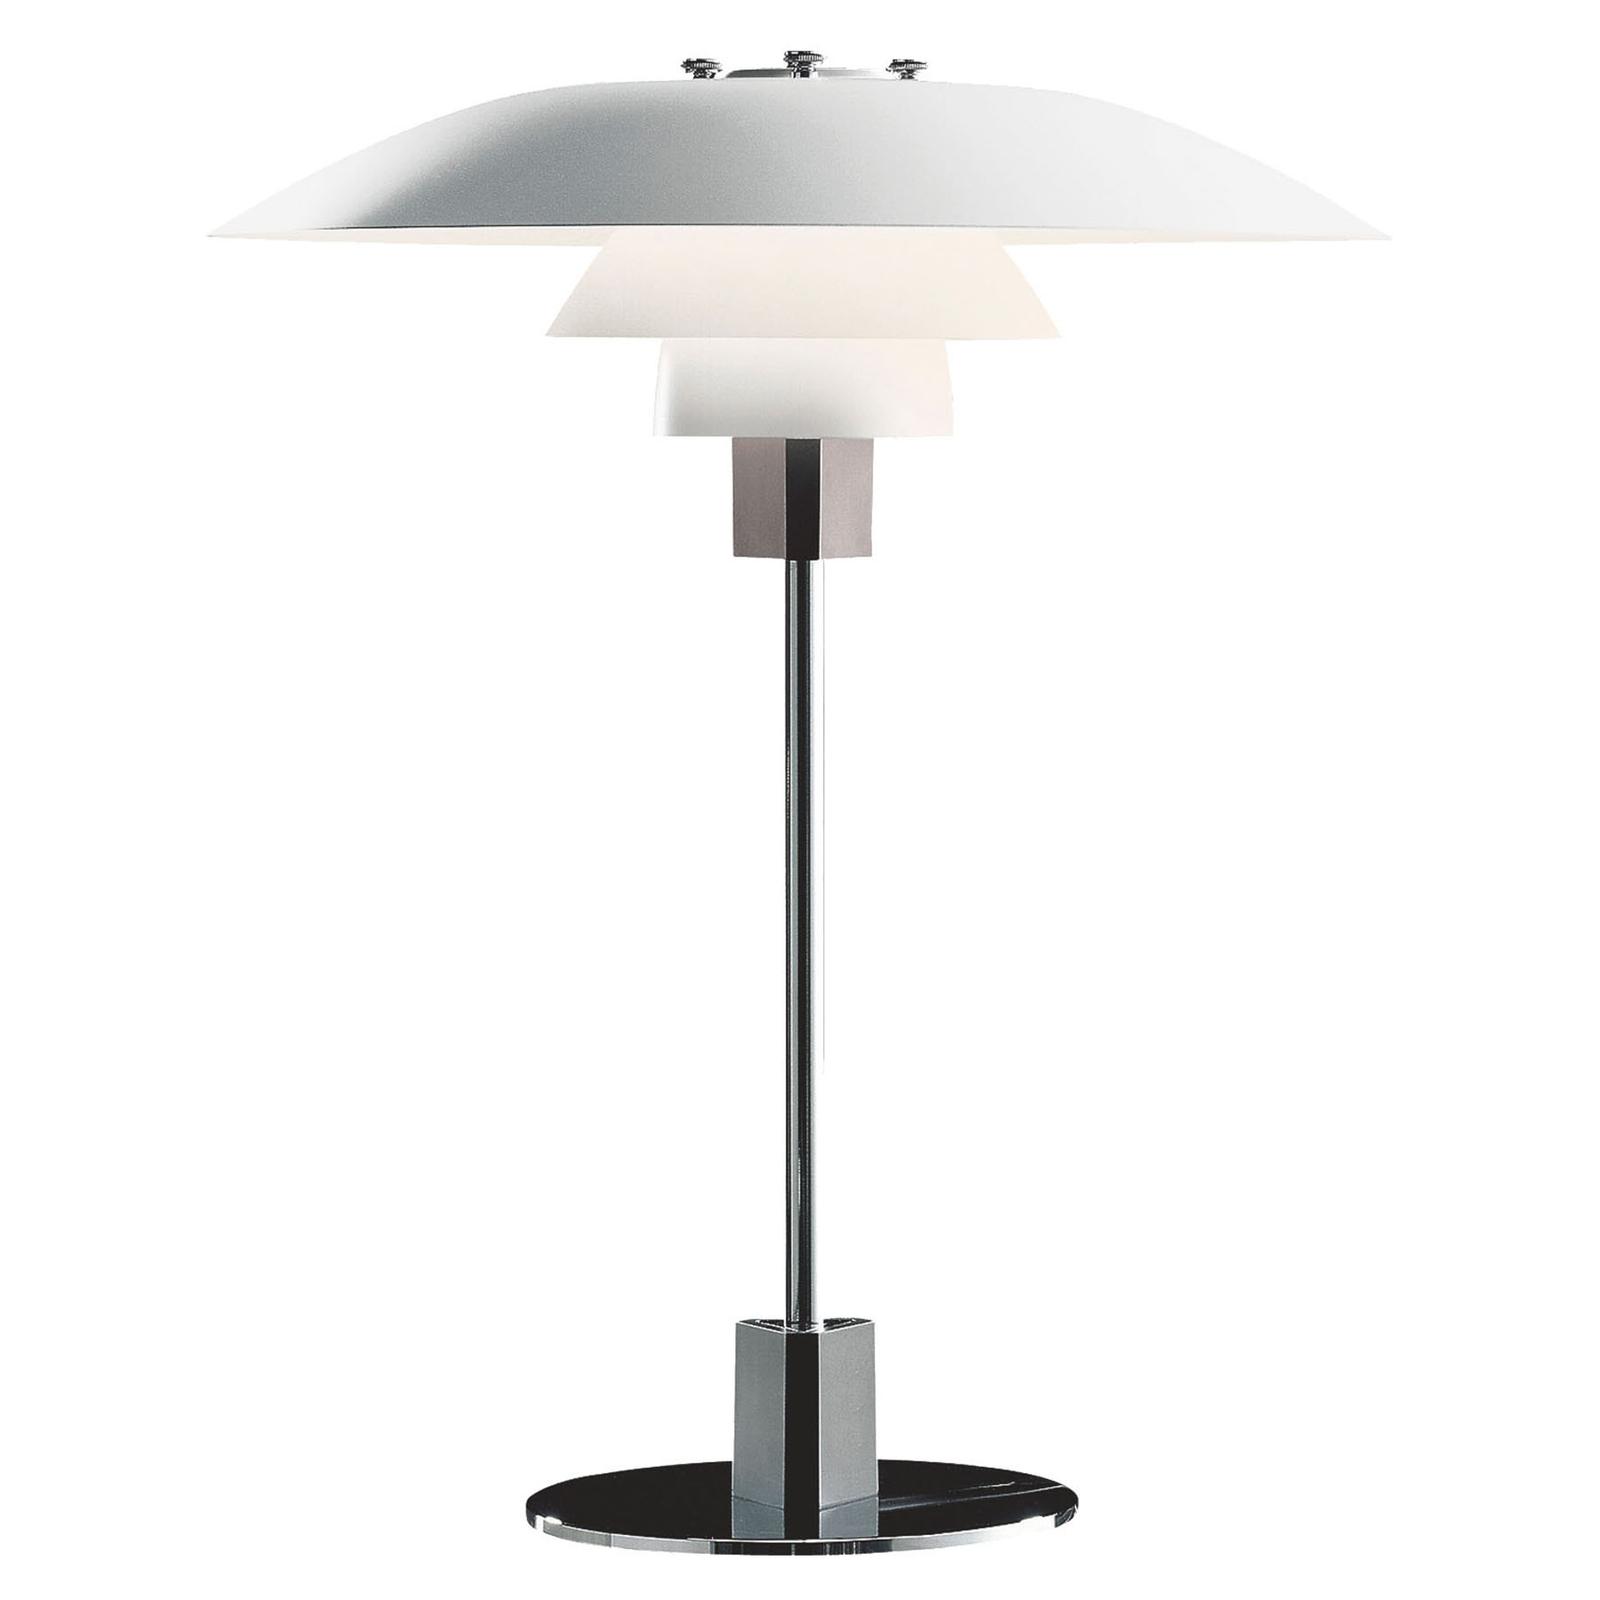 Louis Poulsen PH 4/3 bordlampe krom/hvid